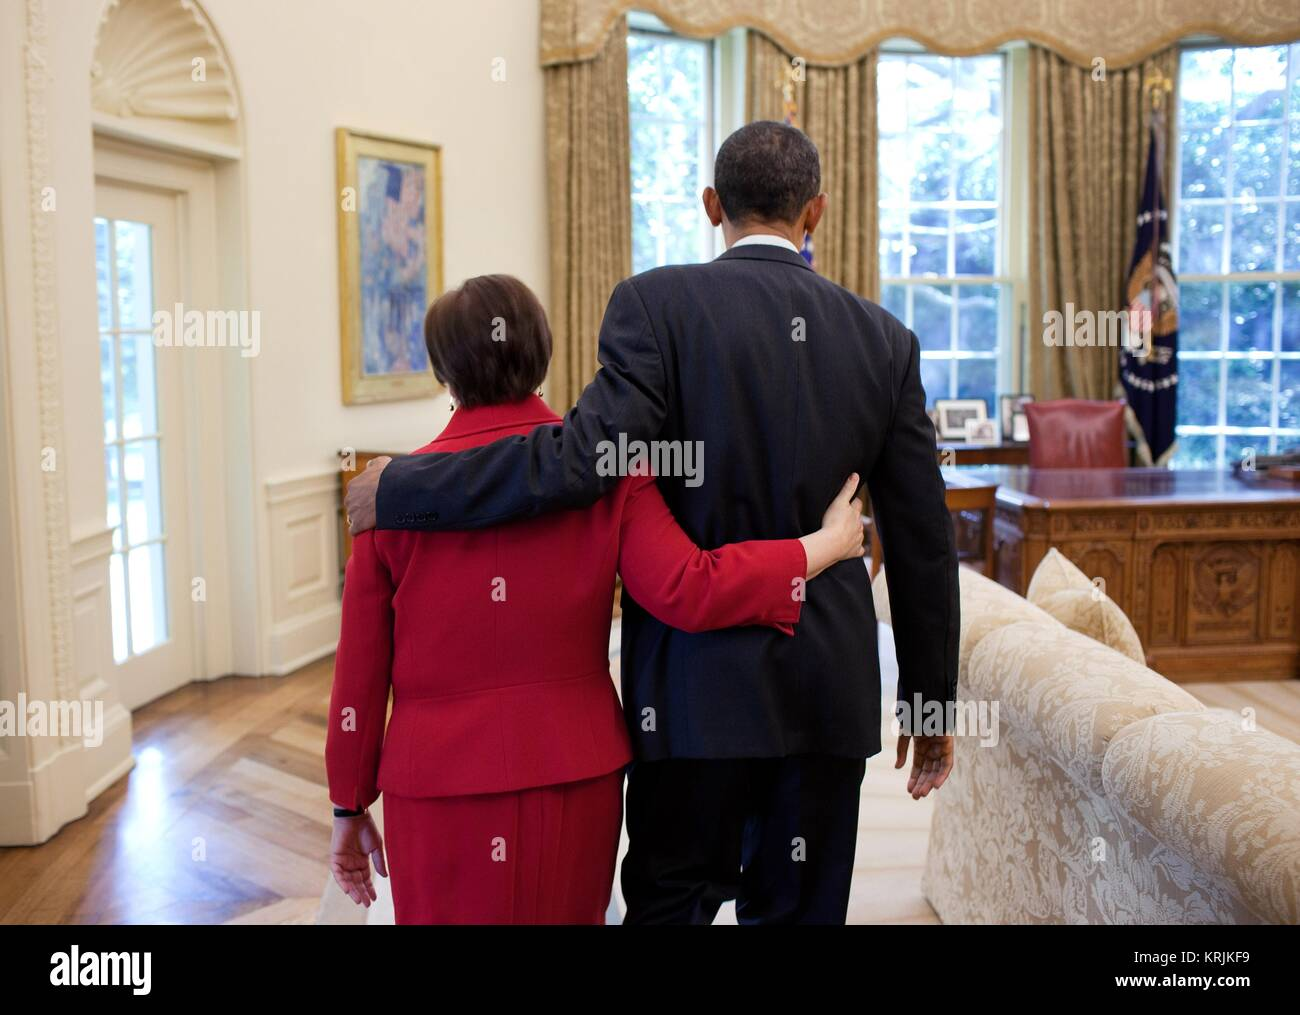 U.S. Supreme Court Justice Elena Kagan (left) and U.S. President Barack Obama walk into the White House Oval Office - Stock Image